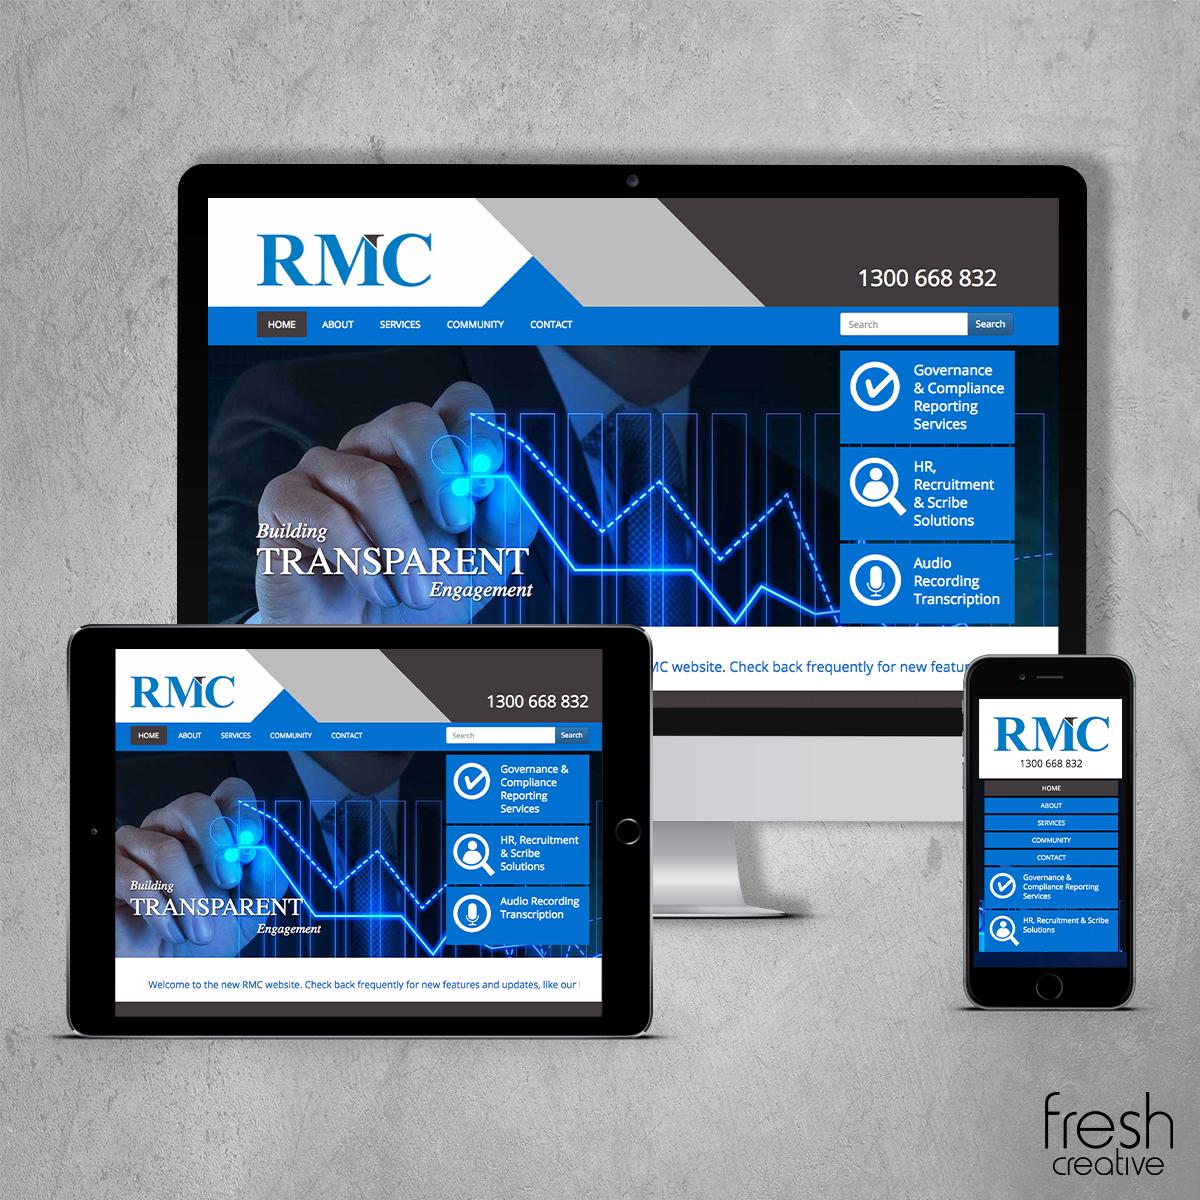 RMC New Website Design